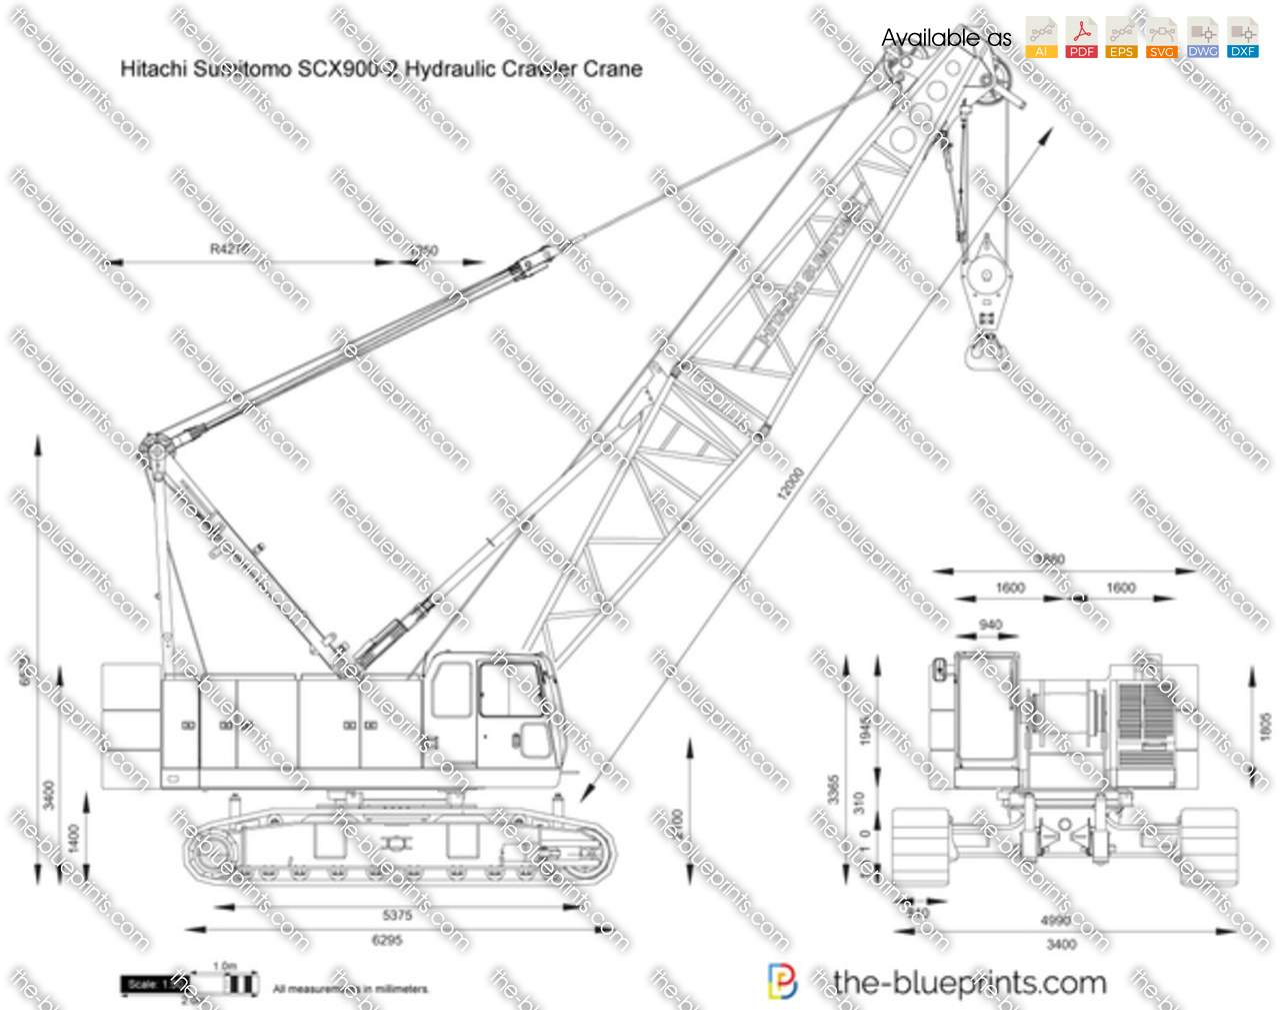 Hitachi Sumitomo SCX900-2 Hydraulic Crawler Crane